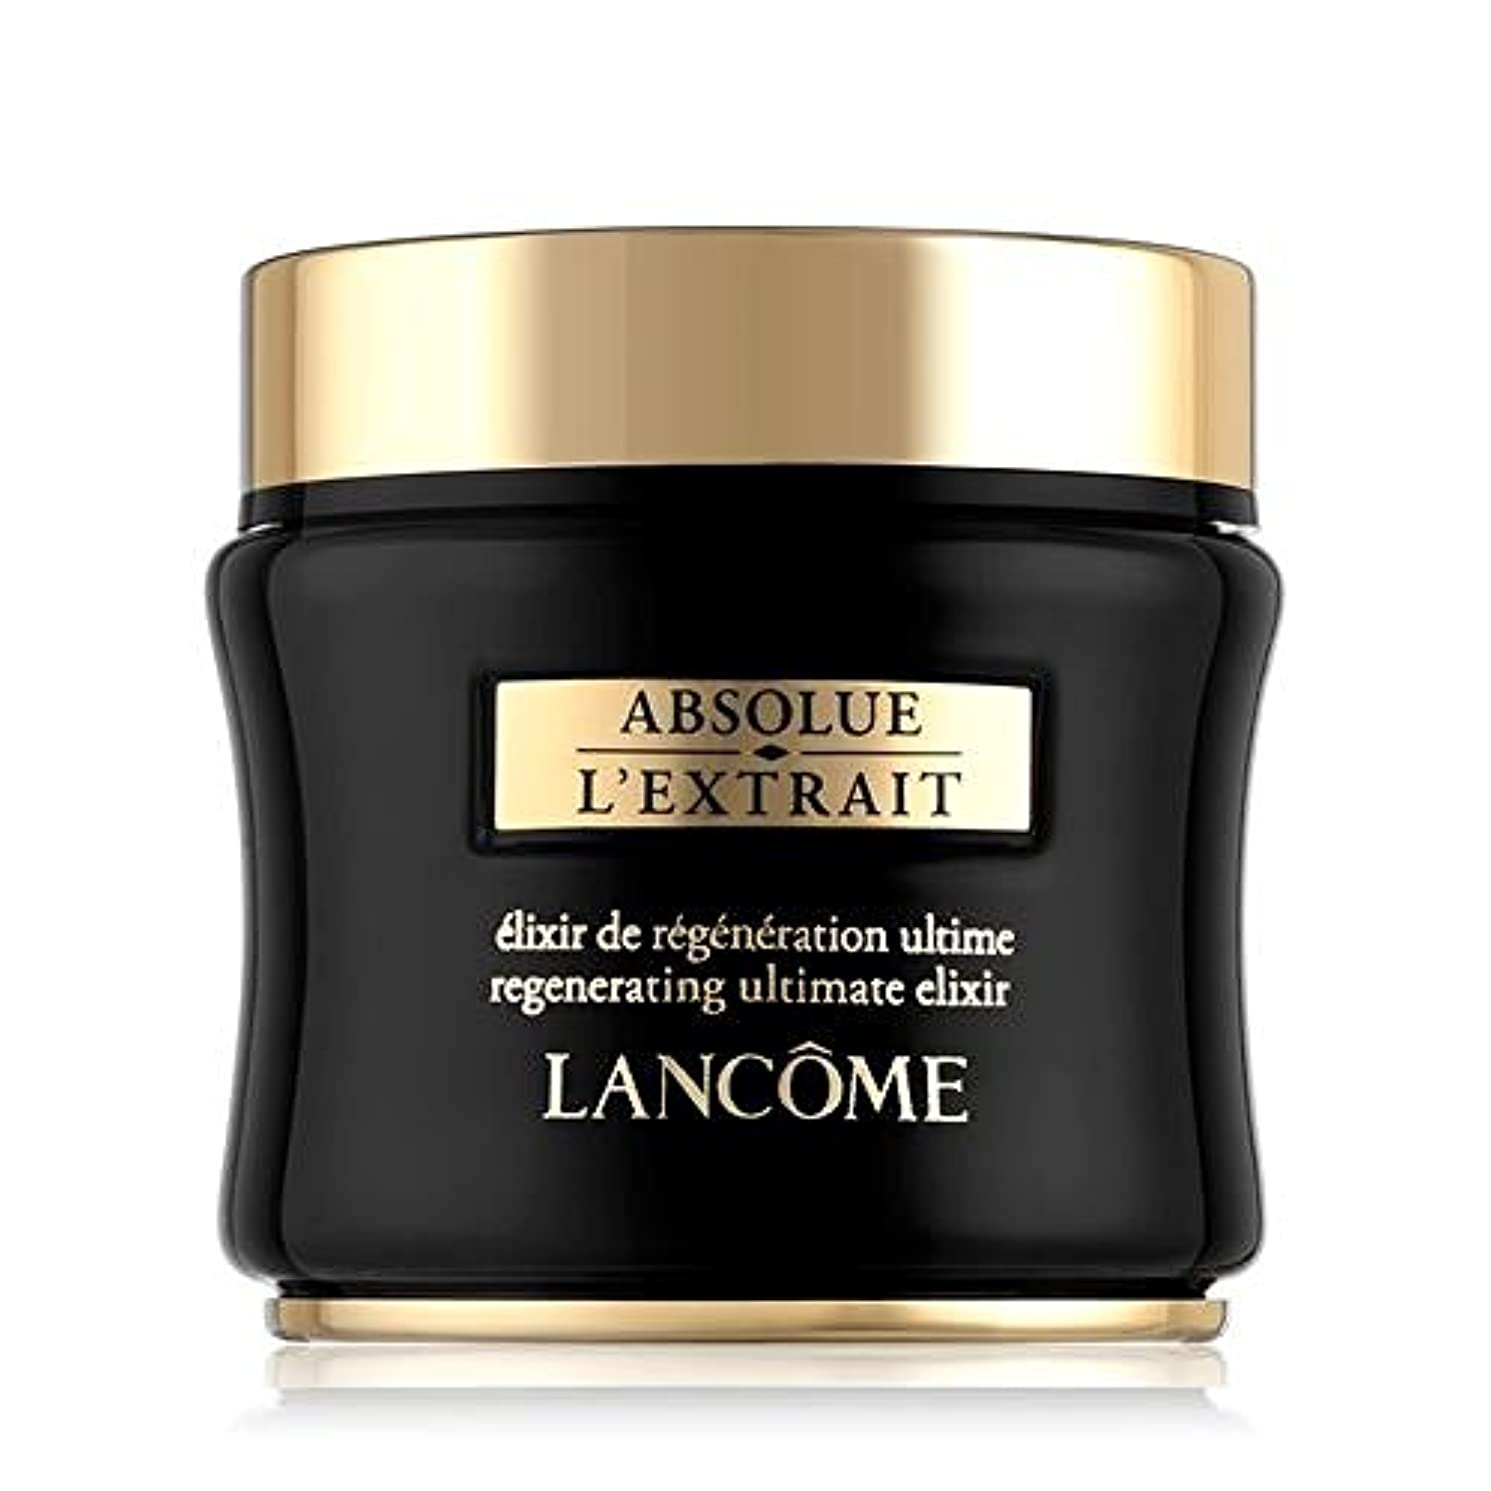 集団的近代化放置ランコム Absolue L'Extrait Ultimate Elixir Cream 50ml/1.7oz並行輸入品